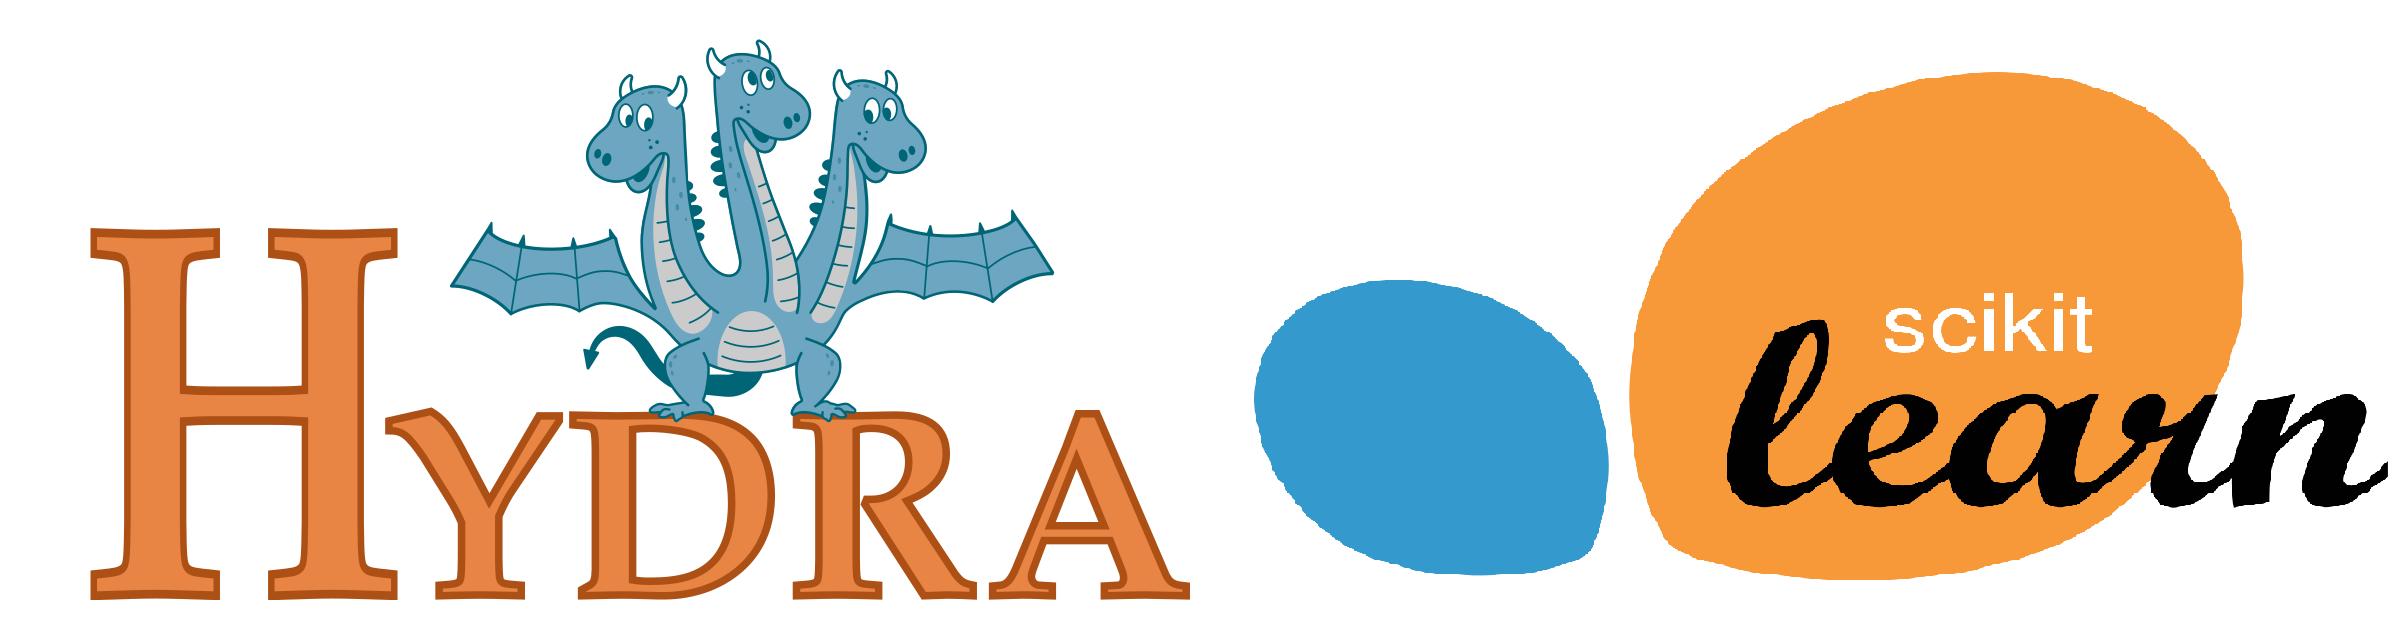 Sklearn-Hydra